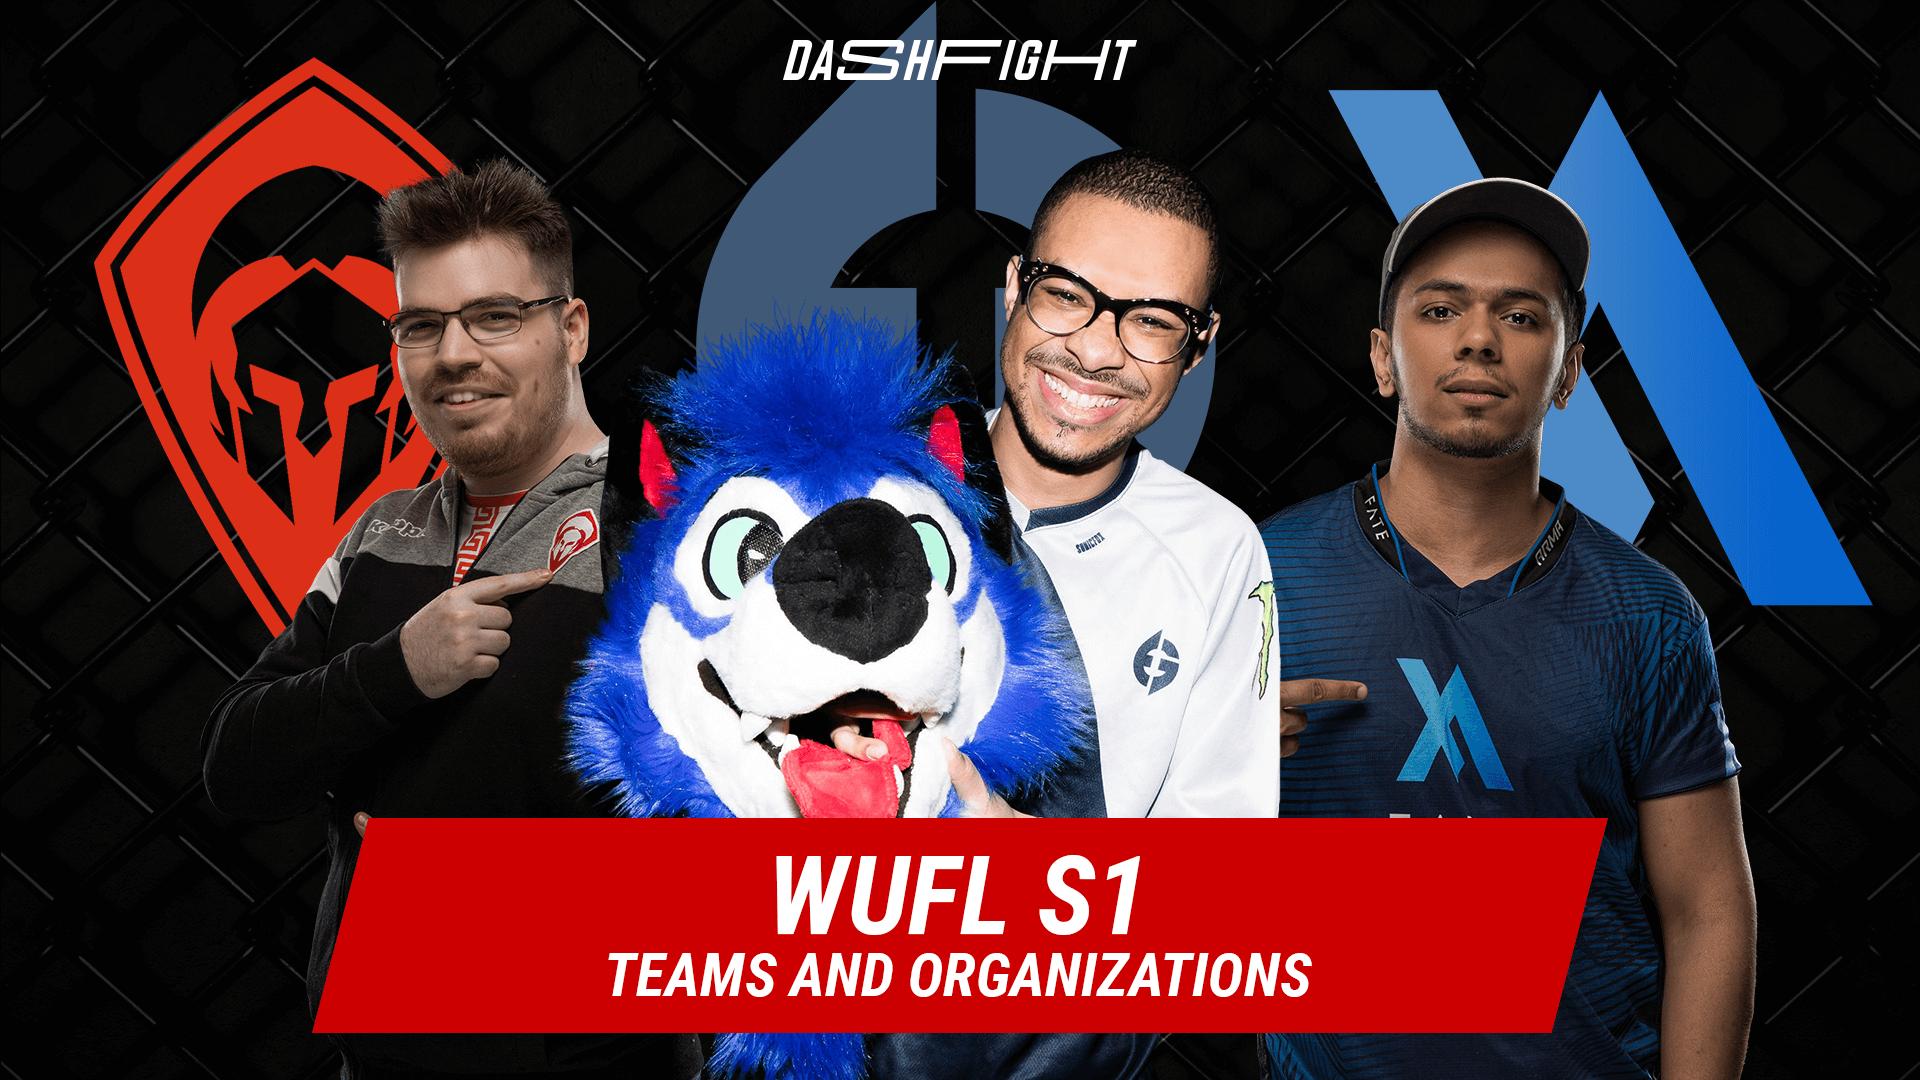 WUFL S1 Teams and Organizations